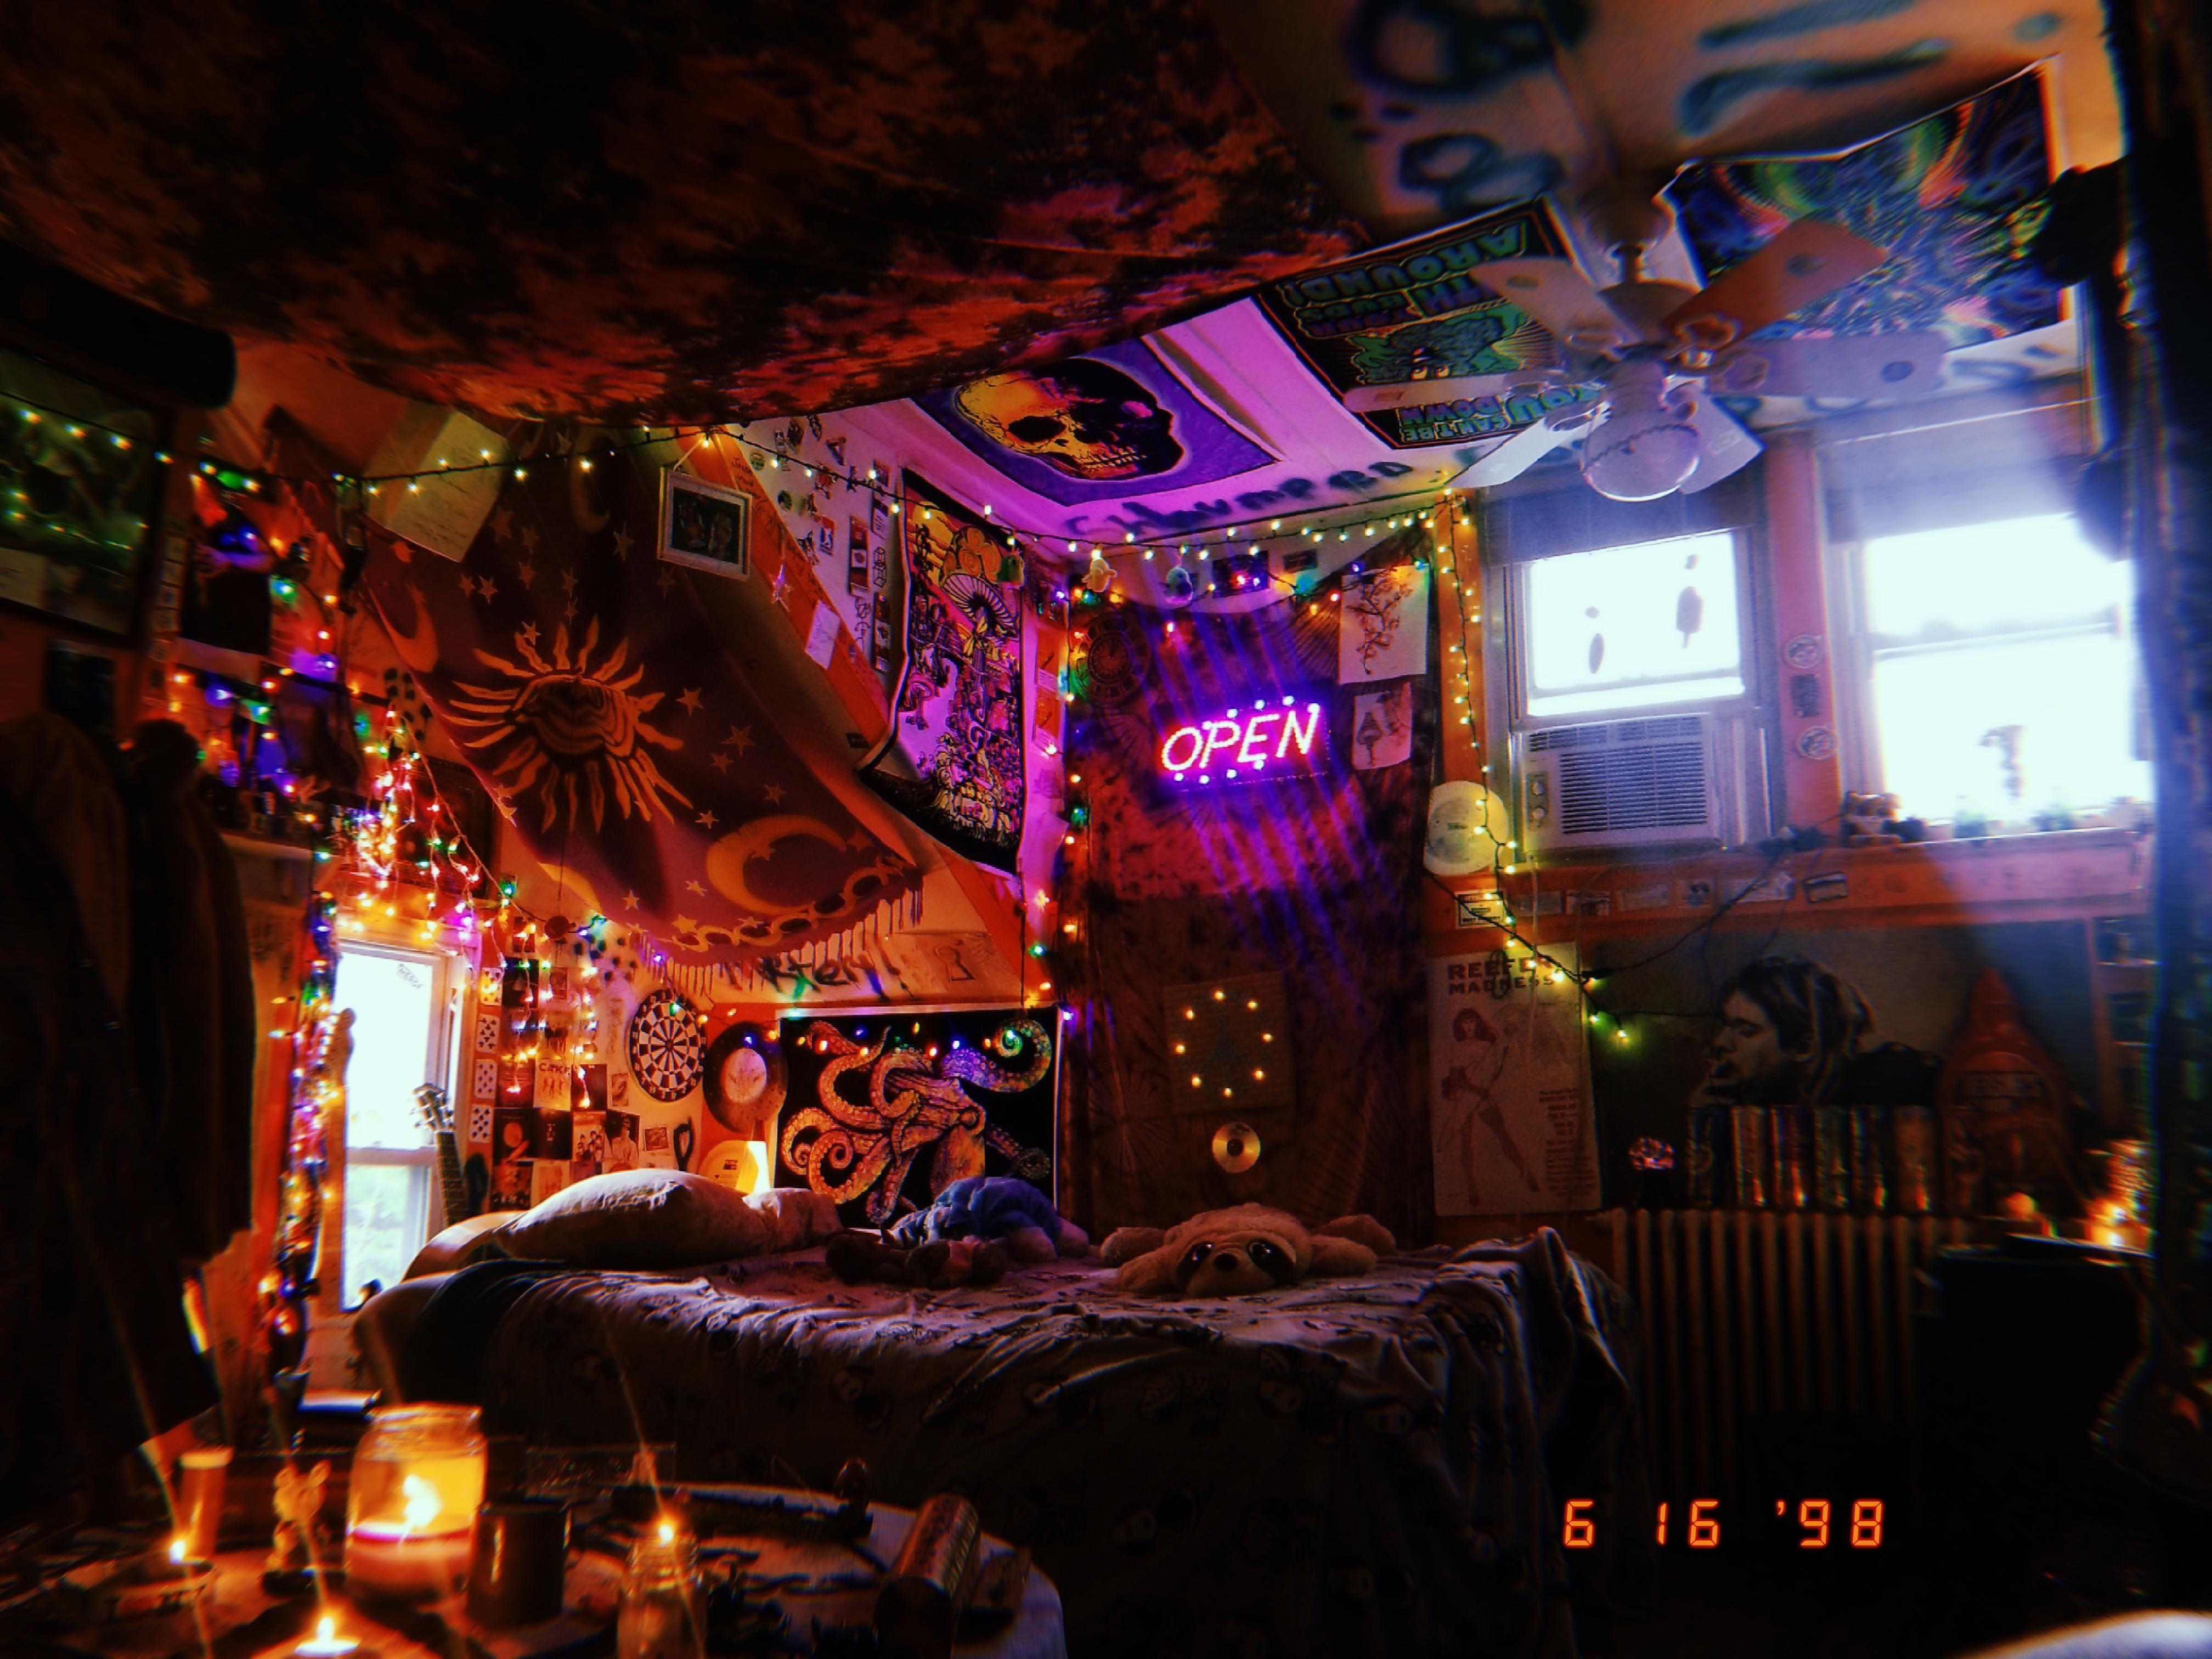 My Trippy Room Aesthetic Room Decor Retro Room Grunge Room